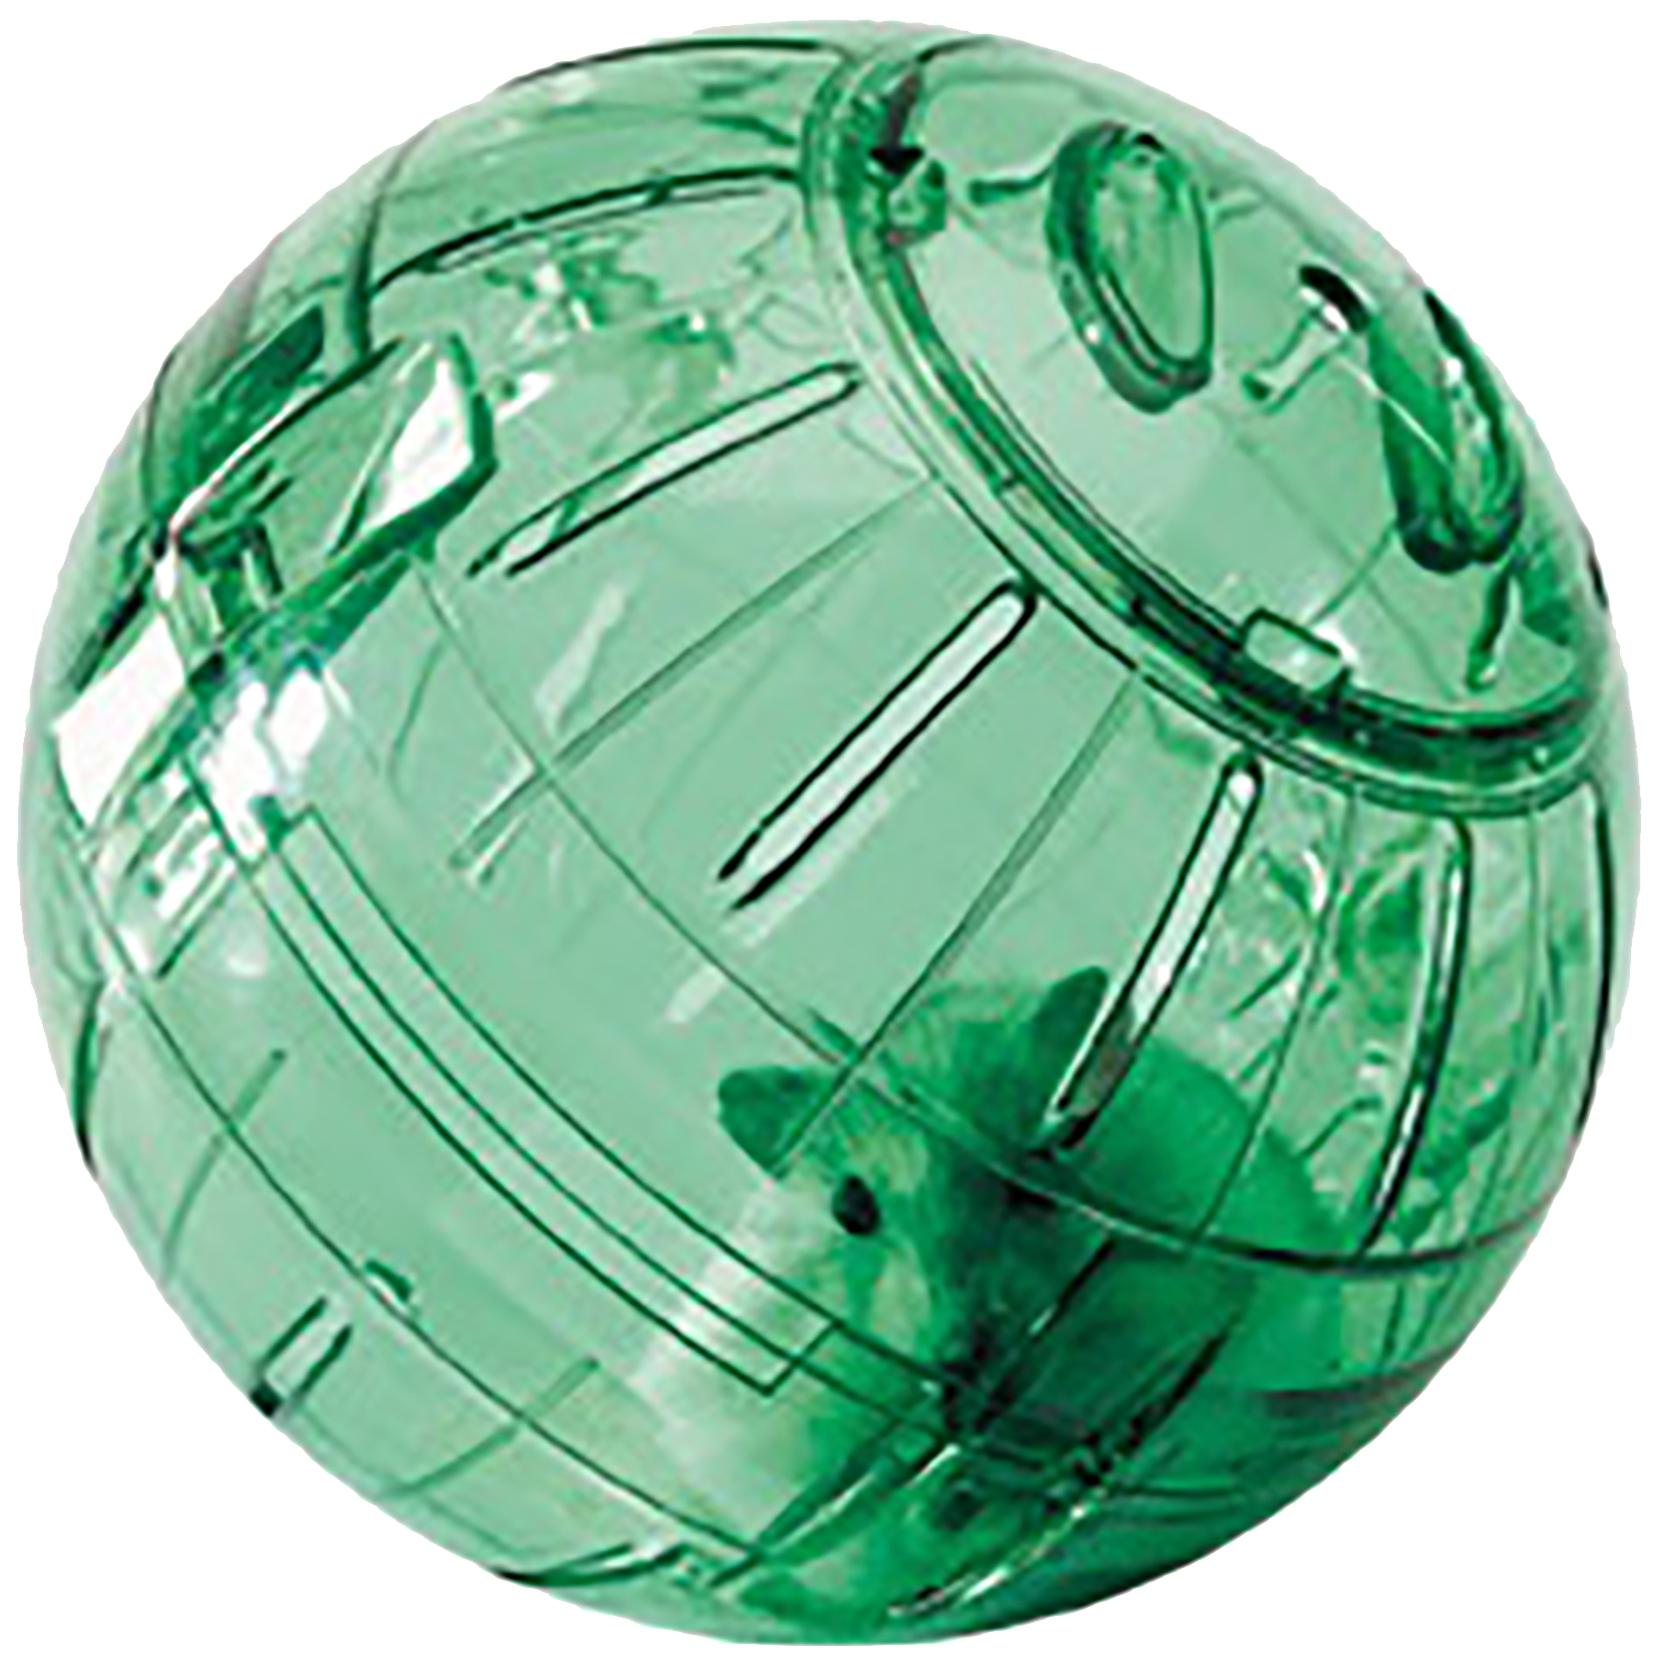 Прогулочный шар для мышей Savic пластик,